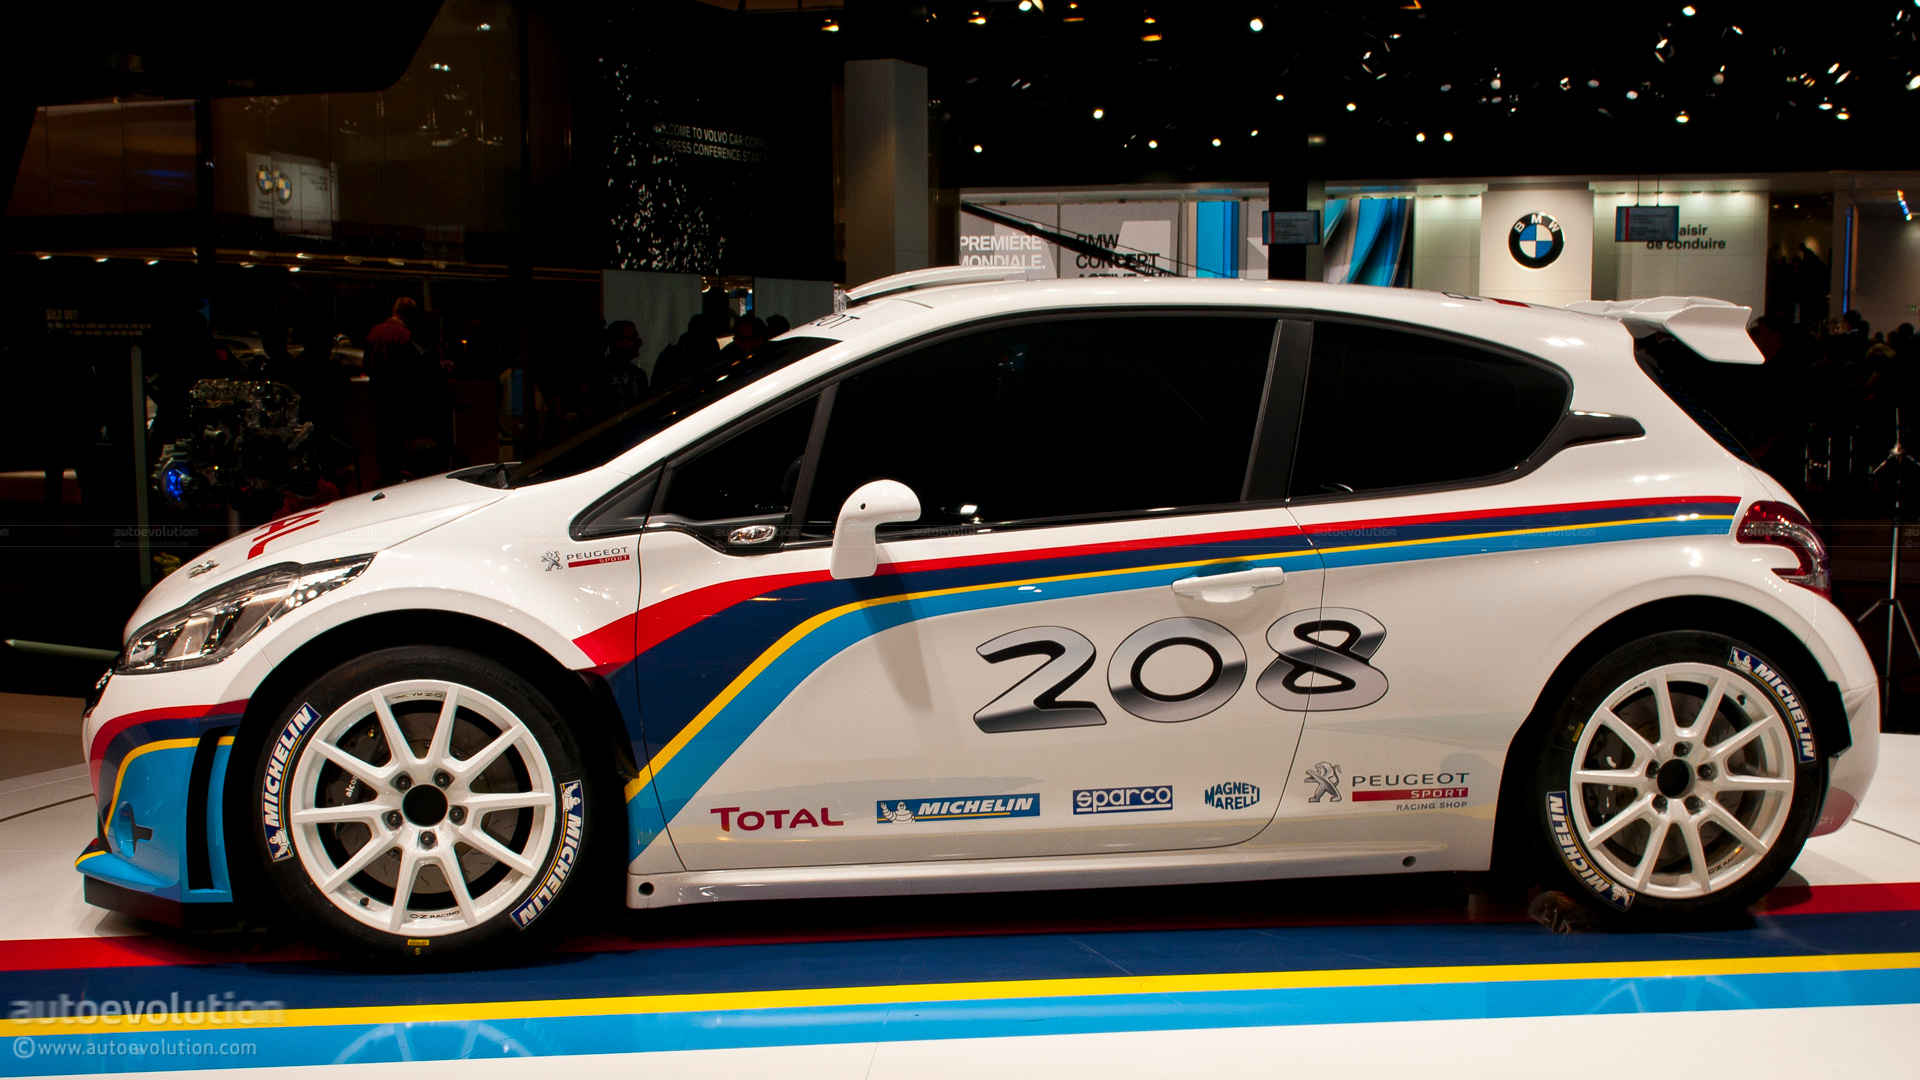 Paris 2012: Peugeot 208 Type R5 Rally Car [Live Photos